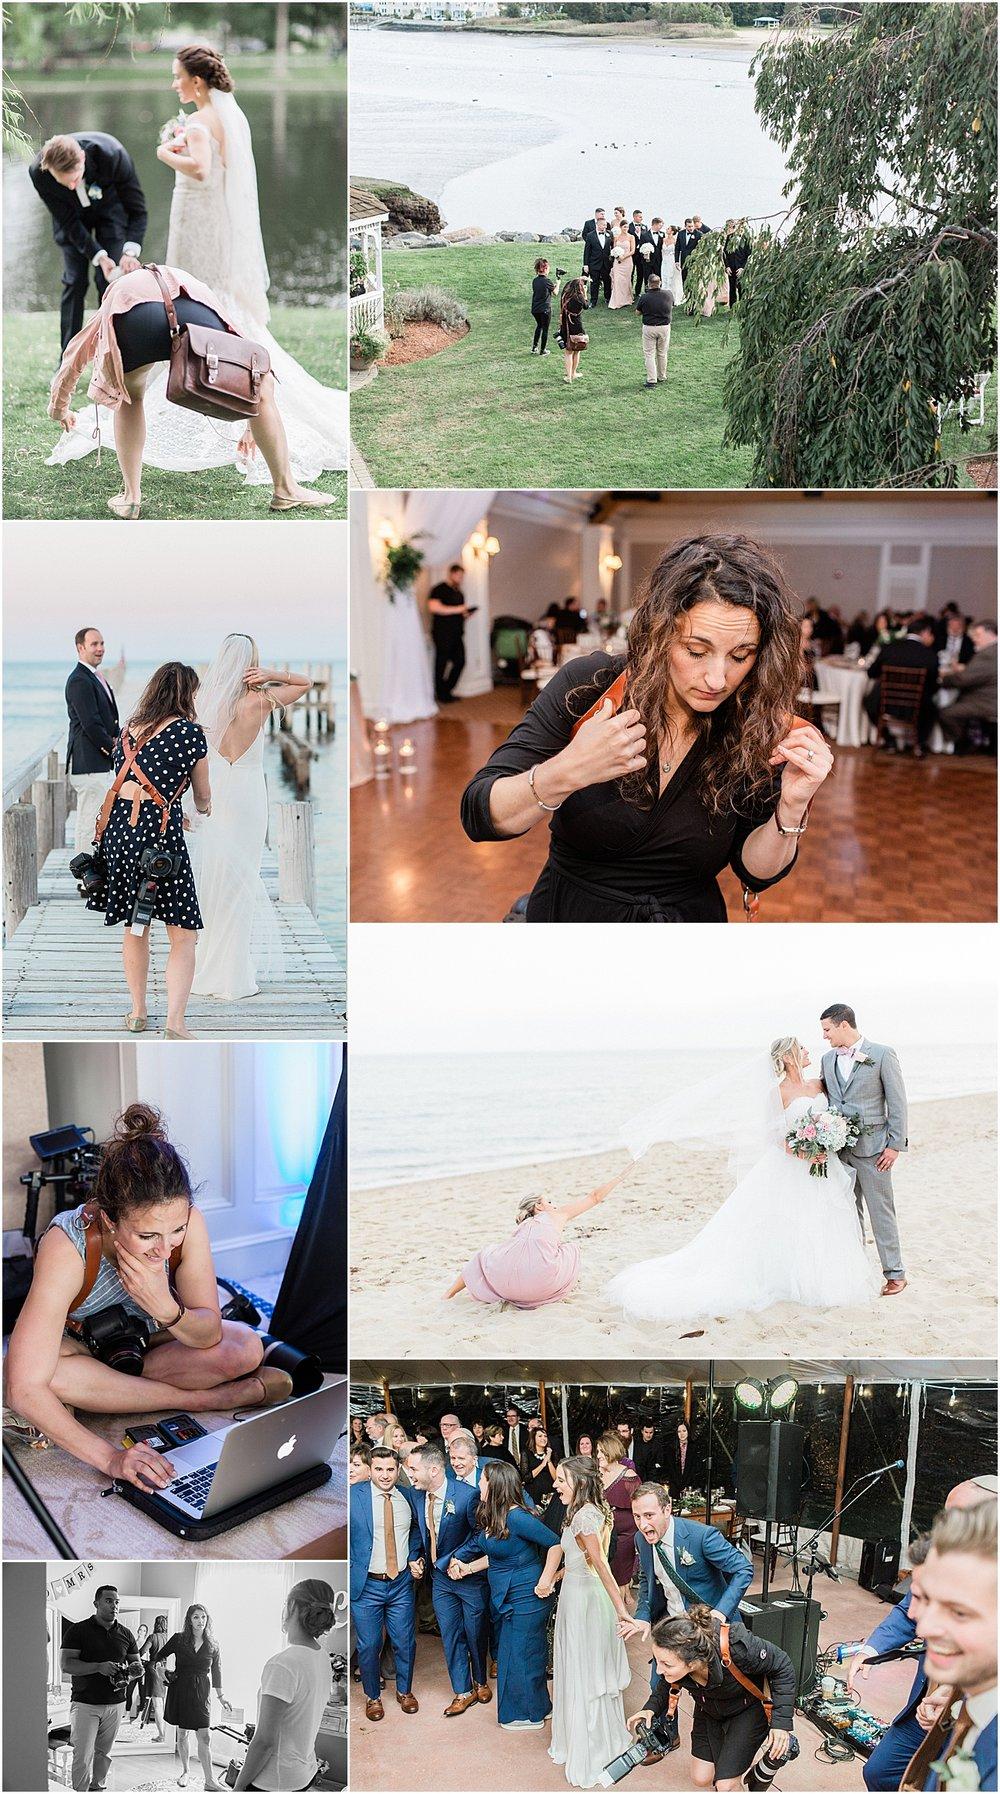 bloopers_2018_cape_cod_boston_wedding_photographer_meredith_jane_photography_chris_kerr_hunter_photo_1860.jpg